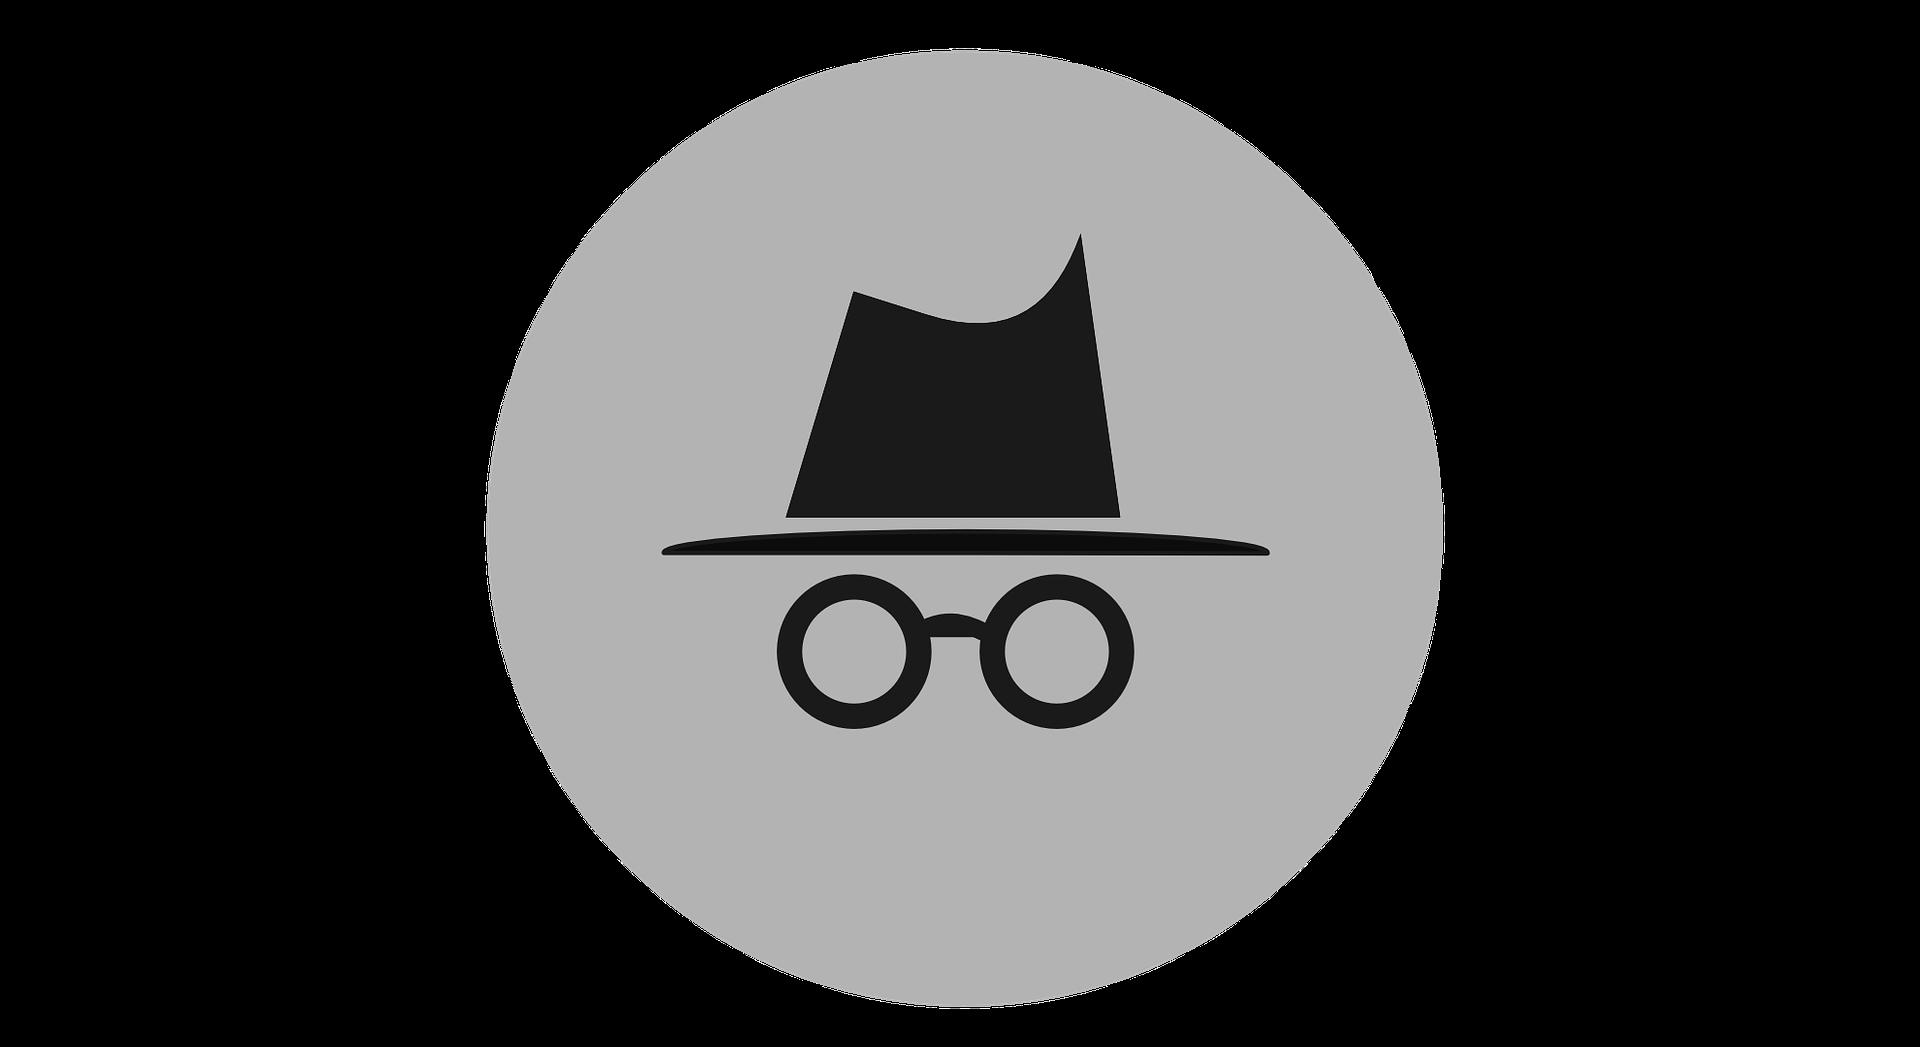 Paysafecard bietet anonyme Zahlungen an